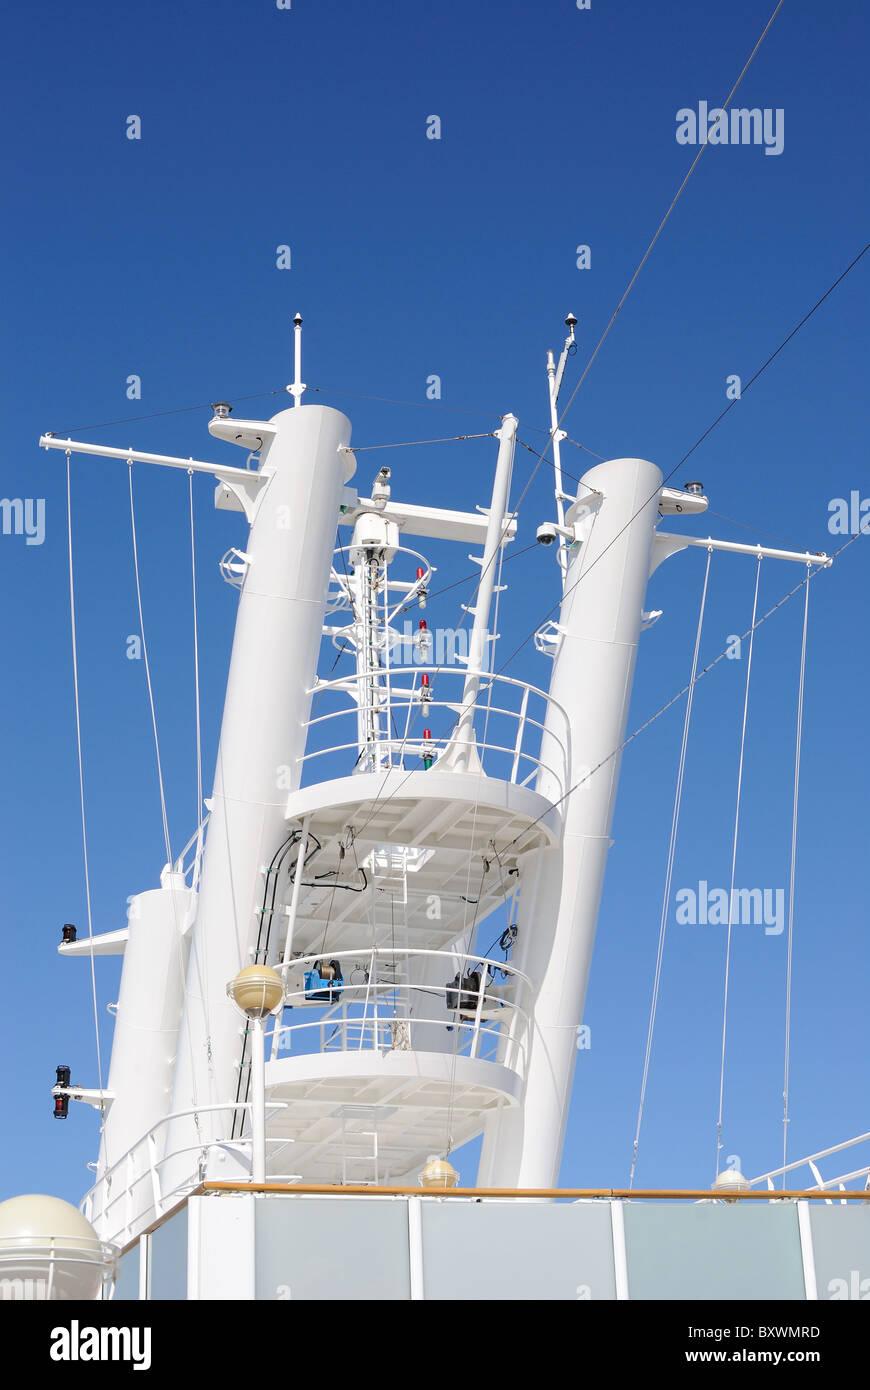 Radar Tower aboard a cruise ship. - Stock Image